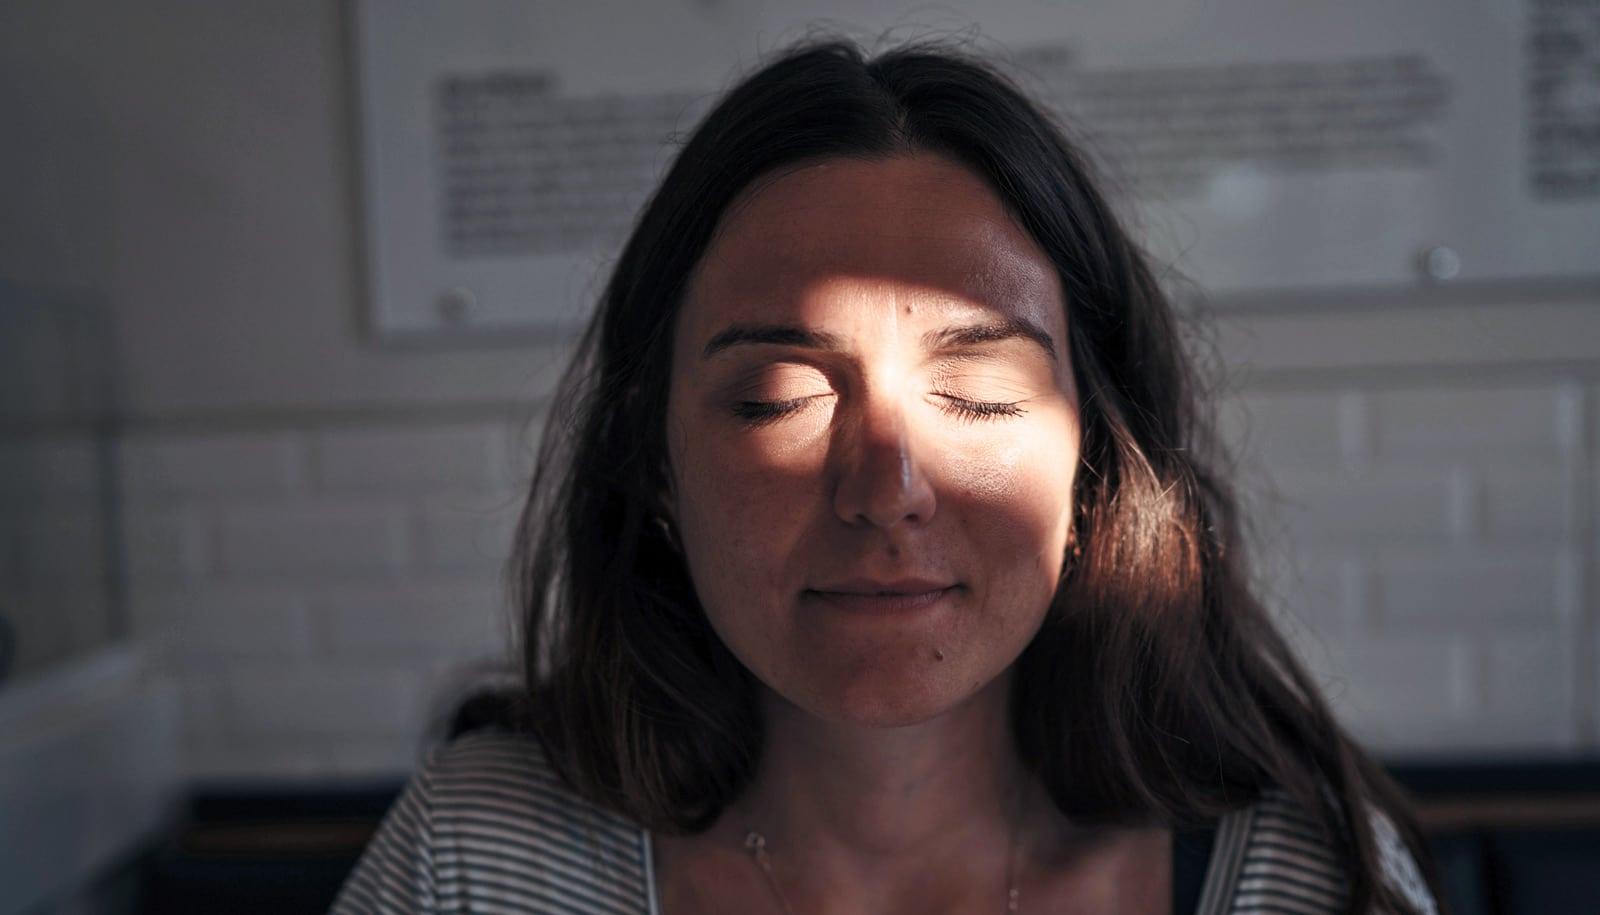 Mindfulness may benefit people on methadone